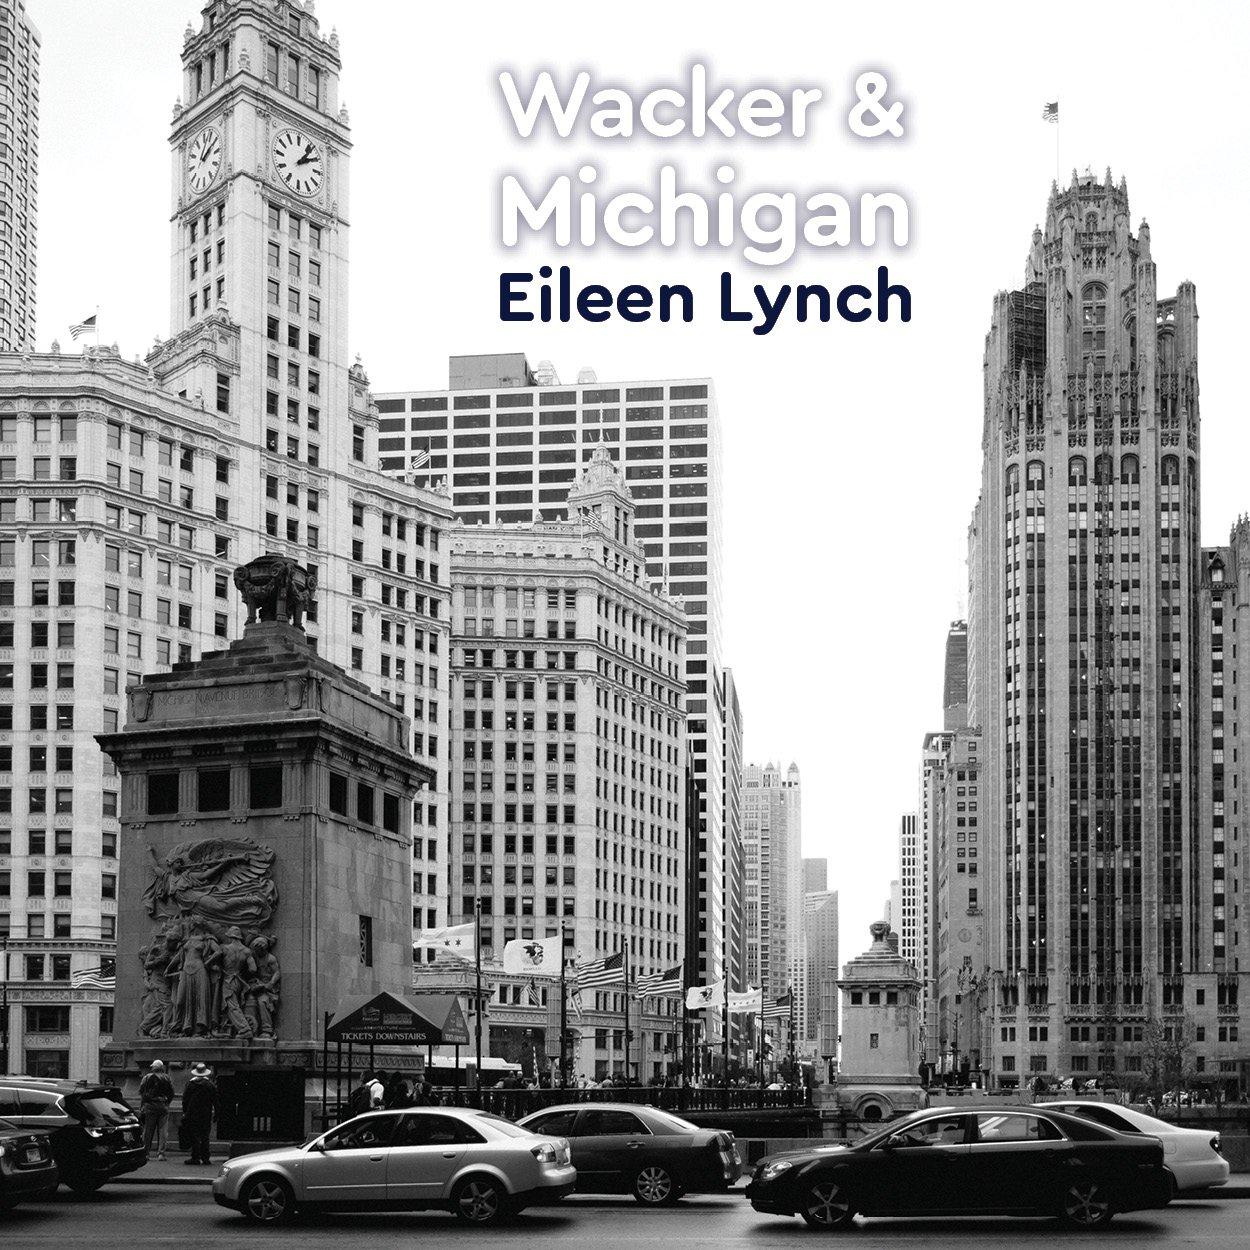 Eileen Lynch at Wacker & Michigan